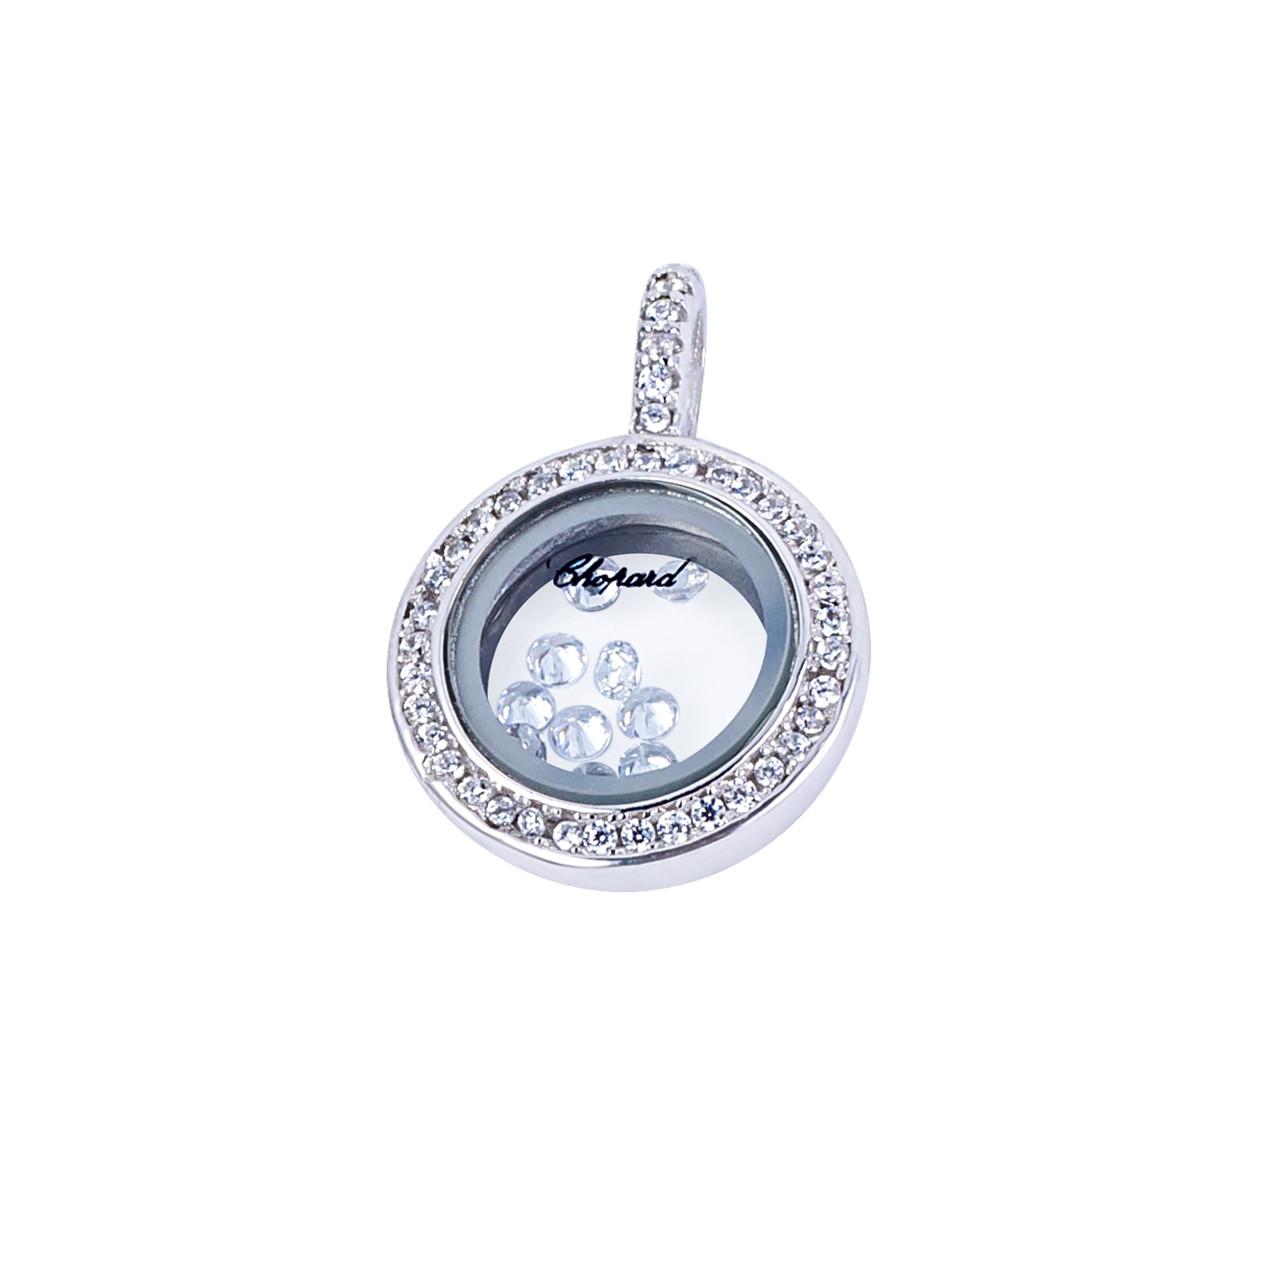 Підвіска TOP Silver 3,43 м 9540200б